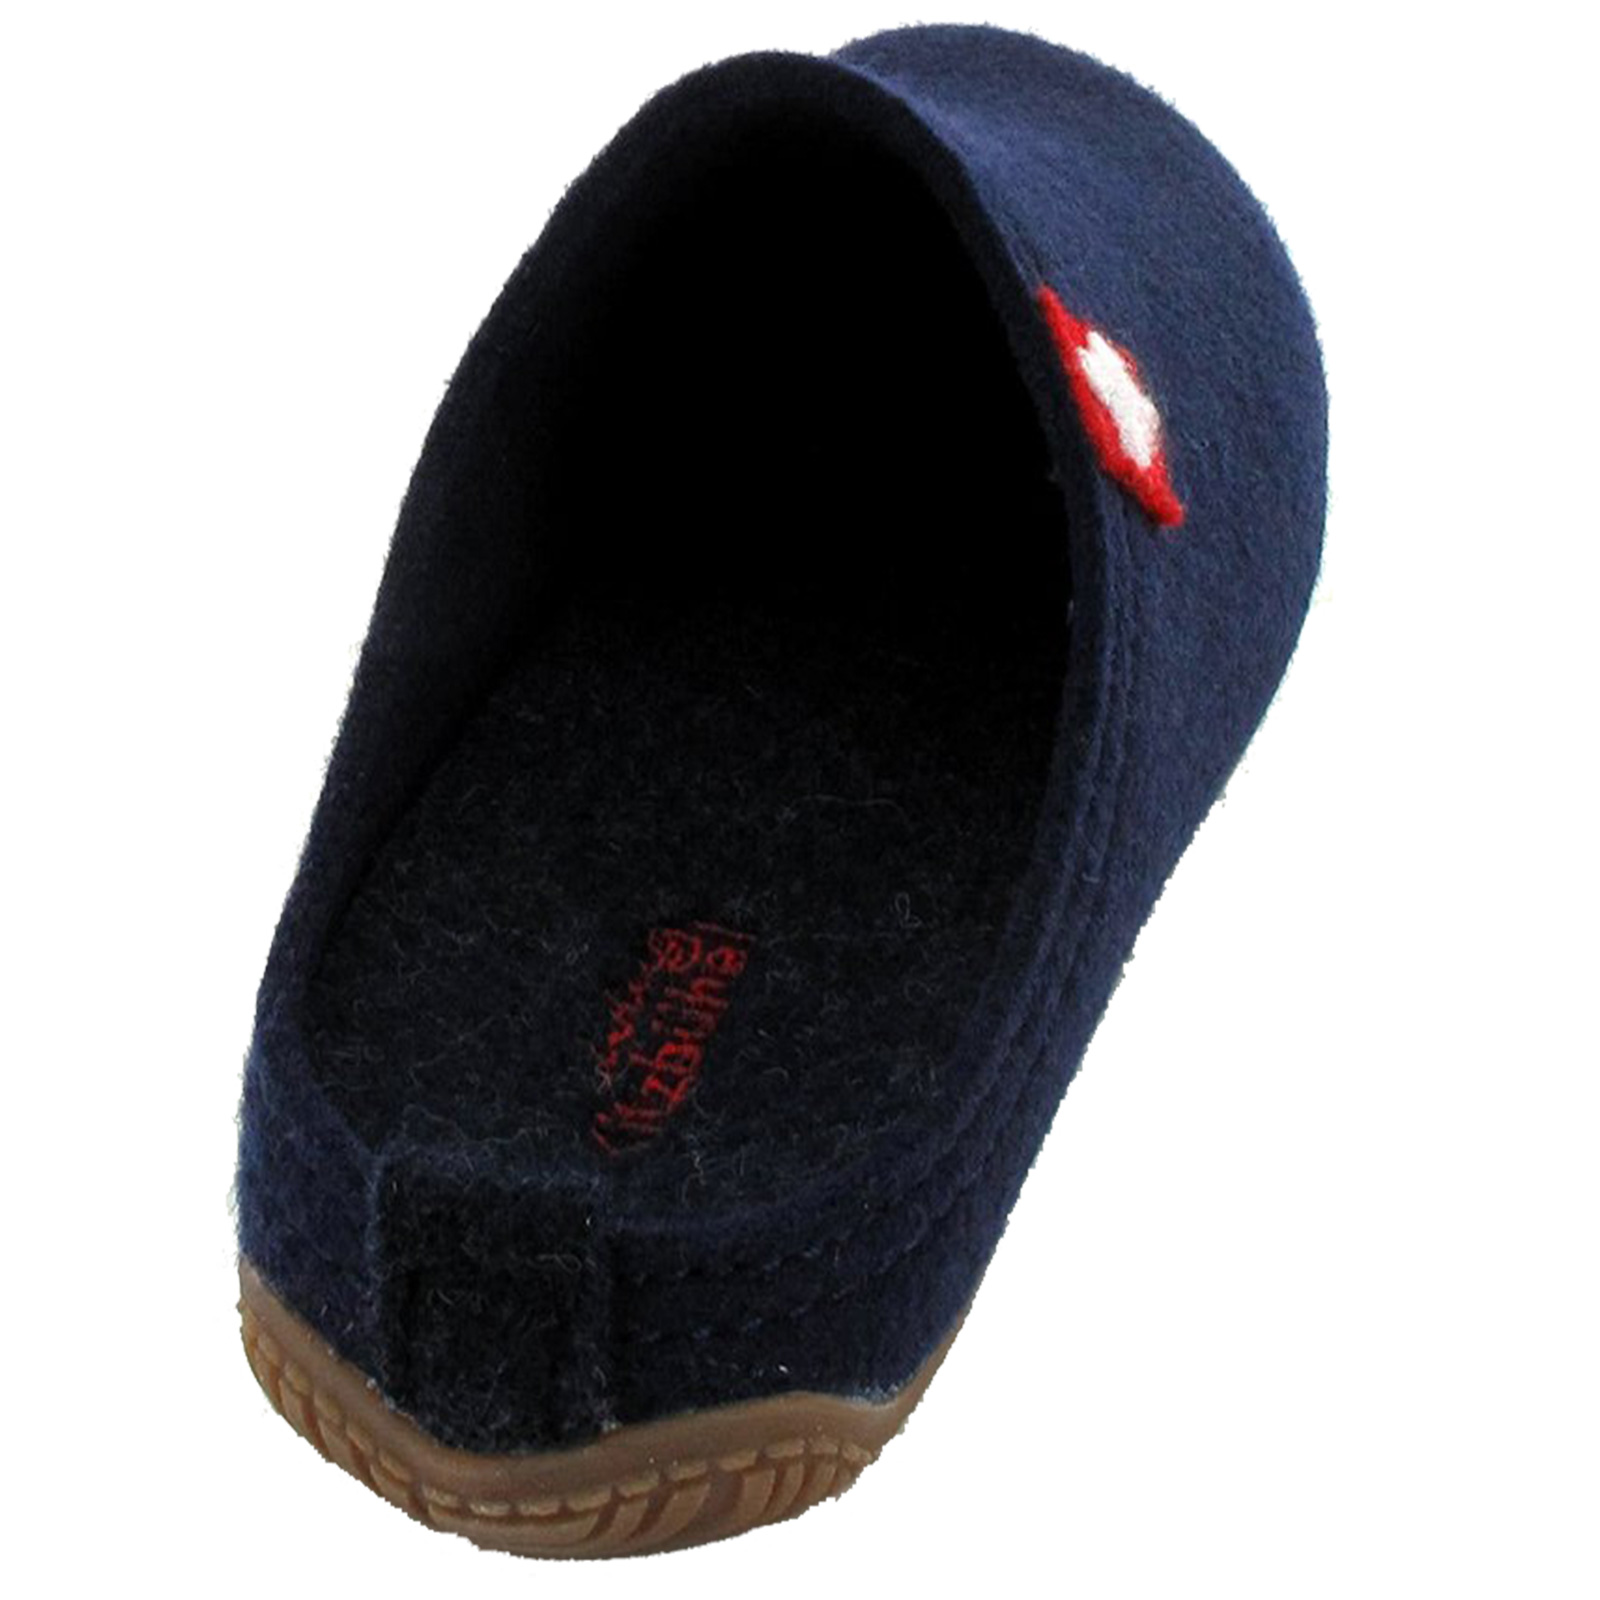 Living Kitzbuhel Ladies Swiss Cross Slippers Lightweight Rubber Sole Wool Warm